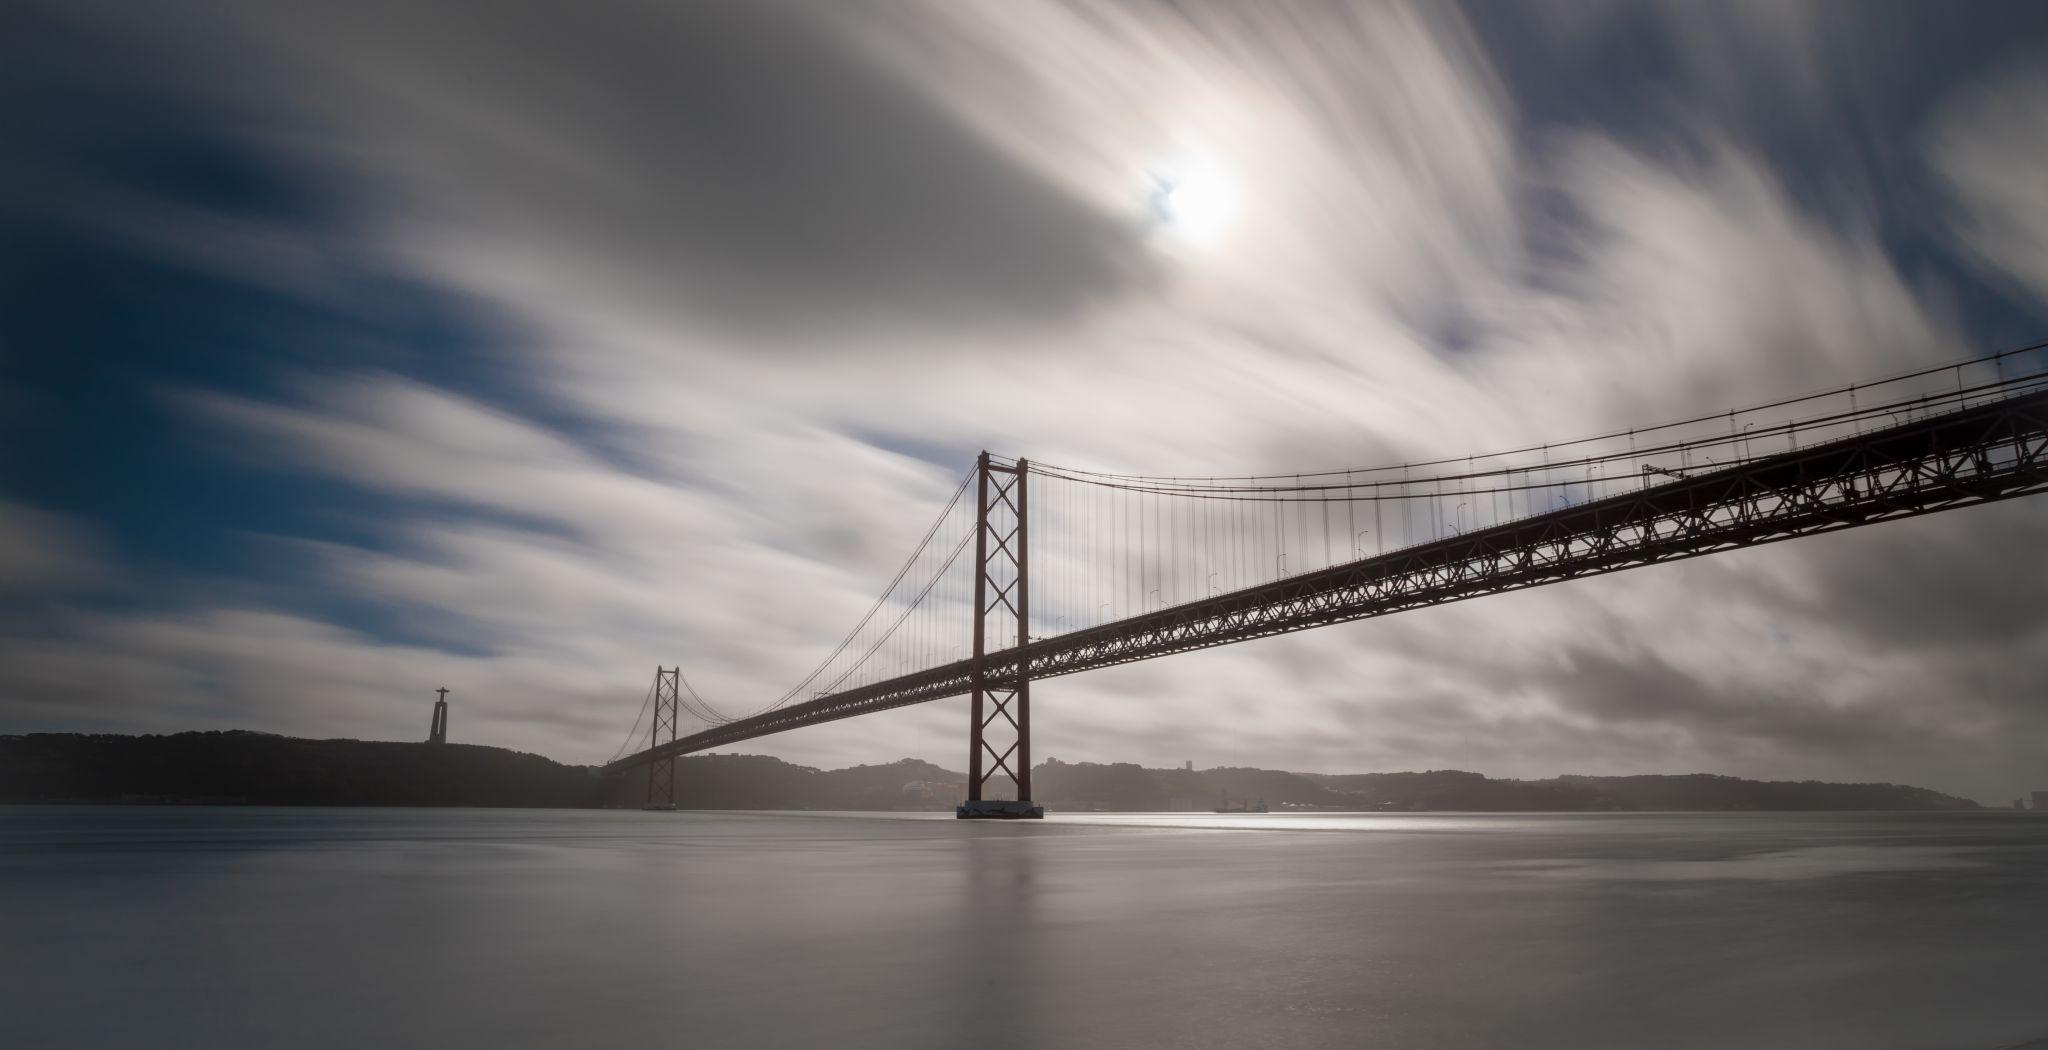 Ponte 25 de Abril Bridge, Portugal